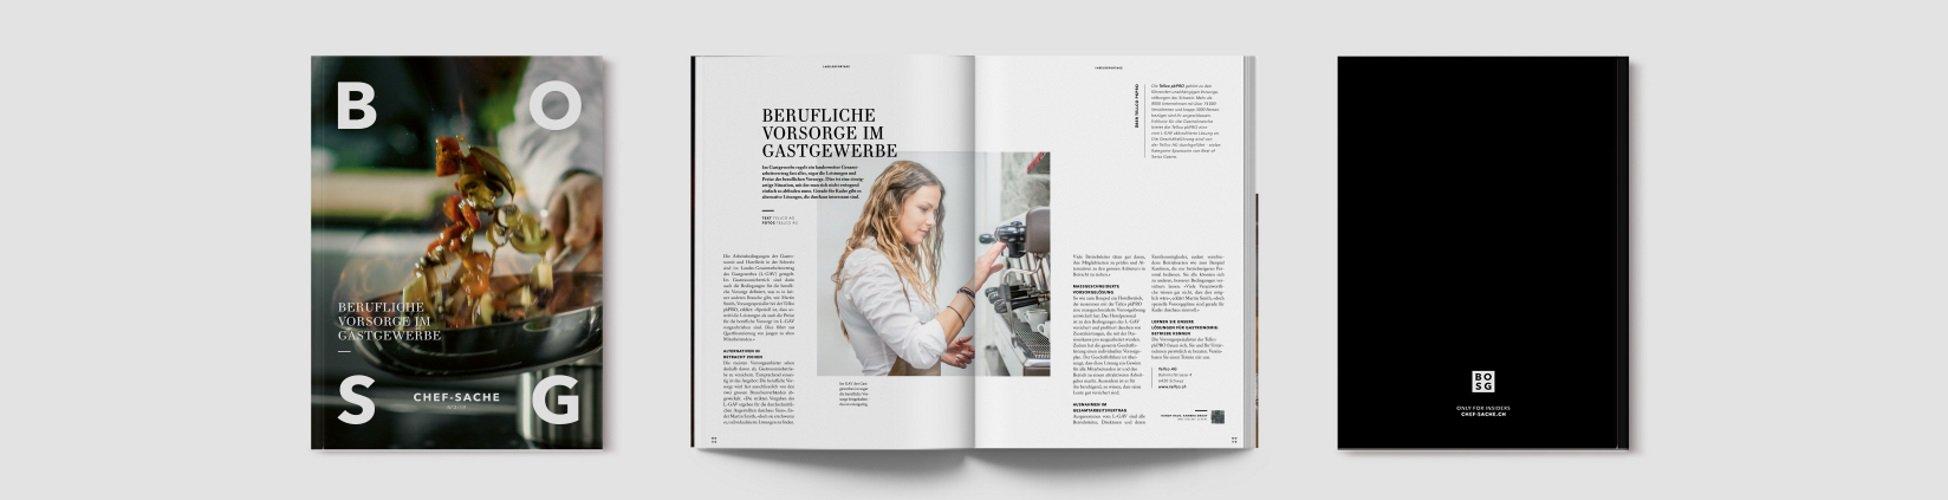 chef-sache-magazin-2-ausgabe-tellco-ag-publi-reportage